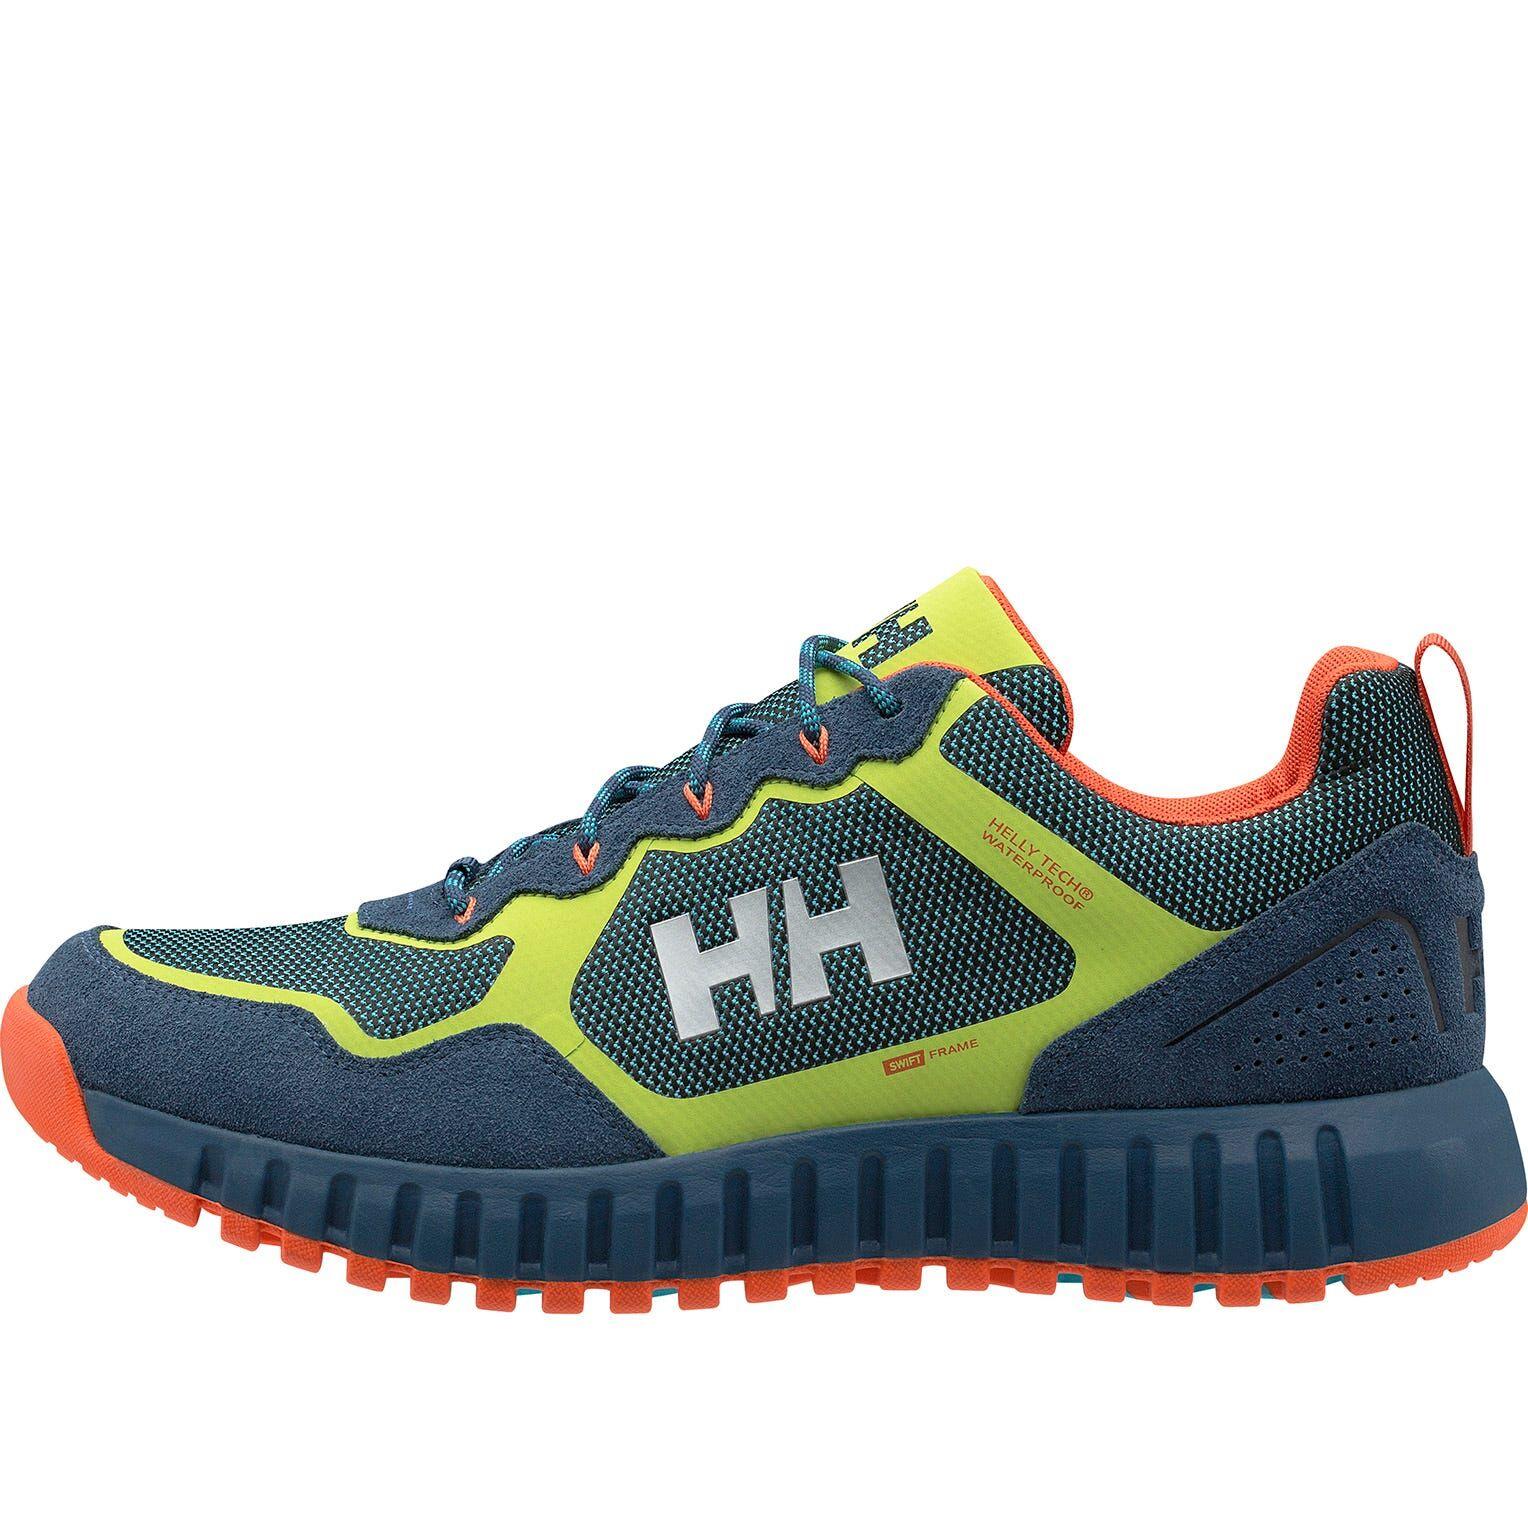 Helly Hansen Monashee Ullr Low Ht Mens Hiking Boot Yellow 44.5/10.5